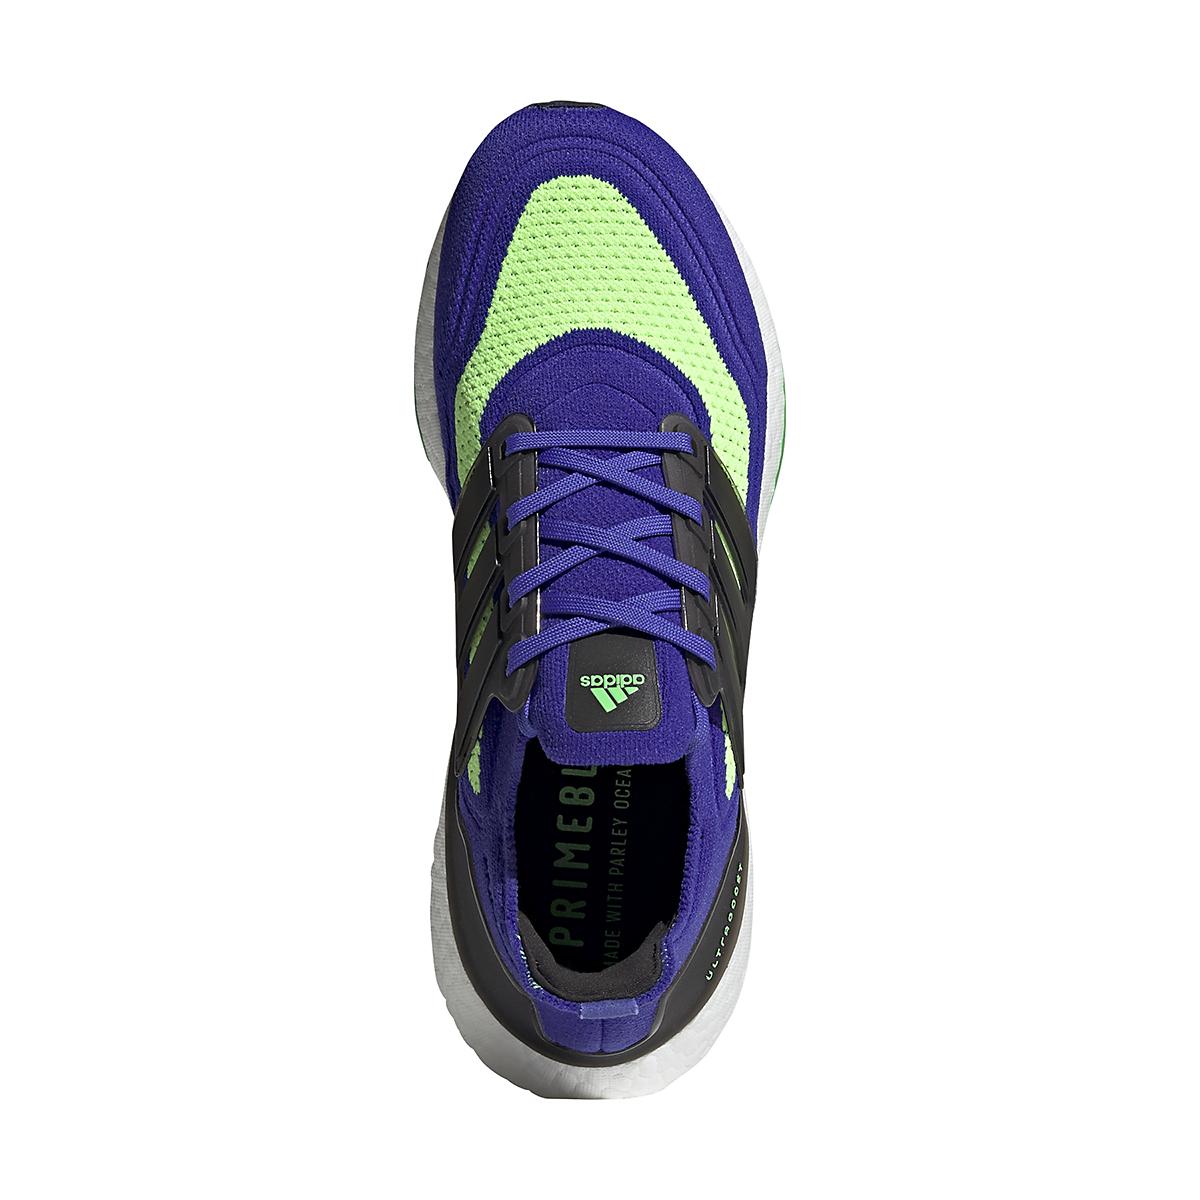 Men's Adidas UltraBOOST 21 Running Shoe - Color: Sonic Ink/Core Black/Screaming Green - Size: 6 - Width: Regular, Sonic Ink/Core Black/Screaming Green, large, image 6